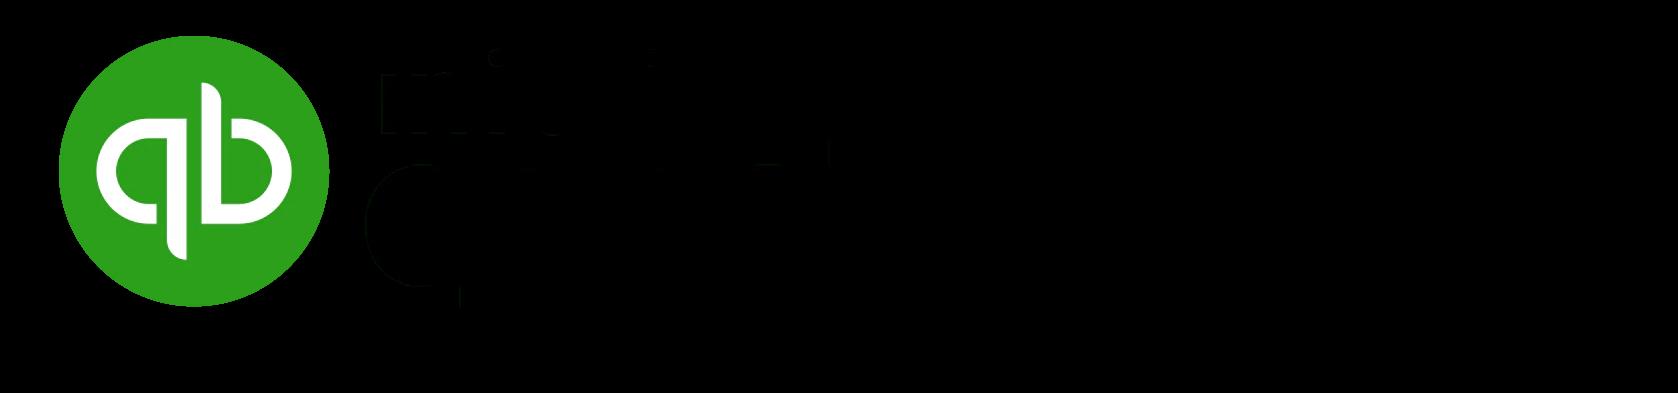 QuickBooks Capital logo